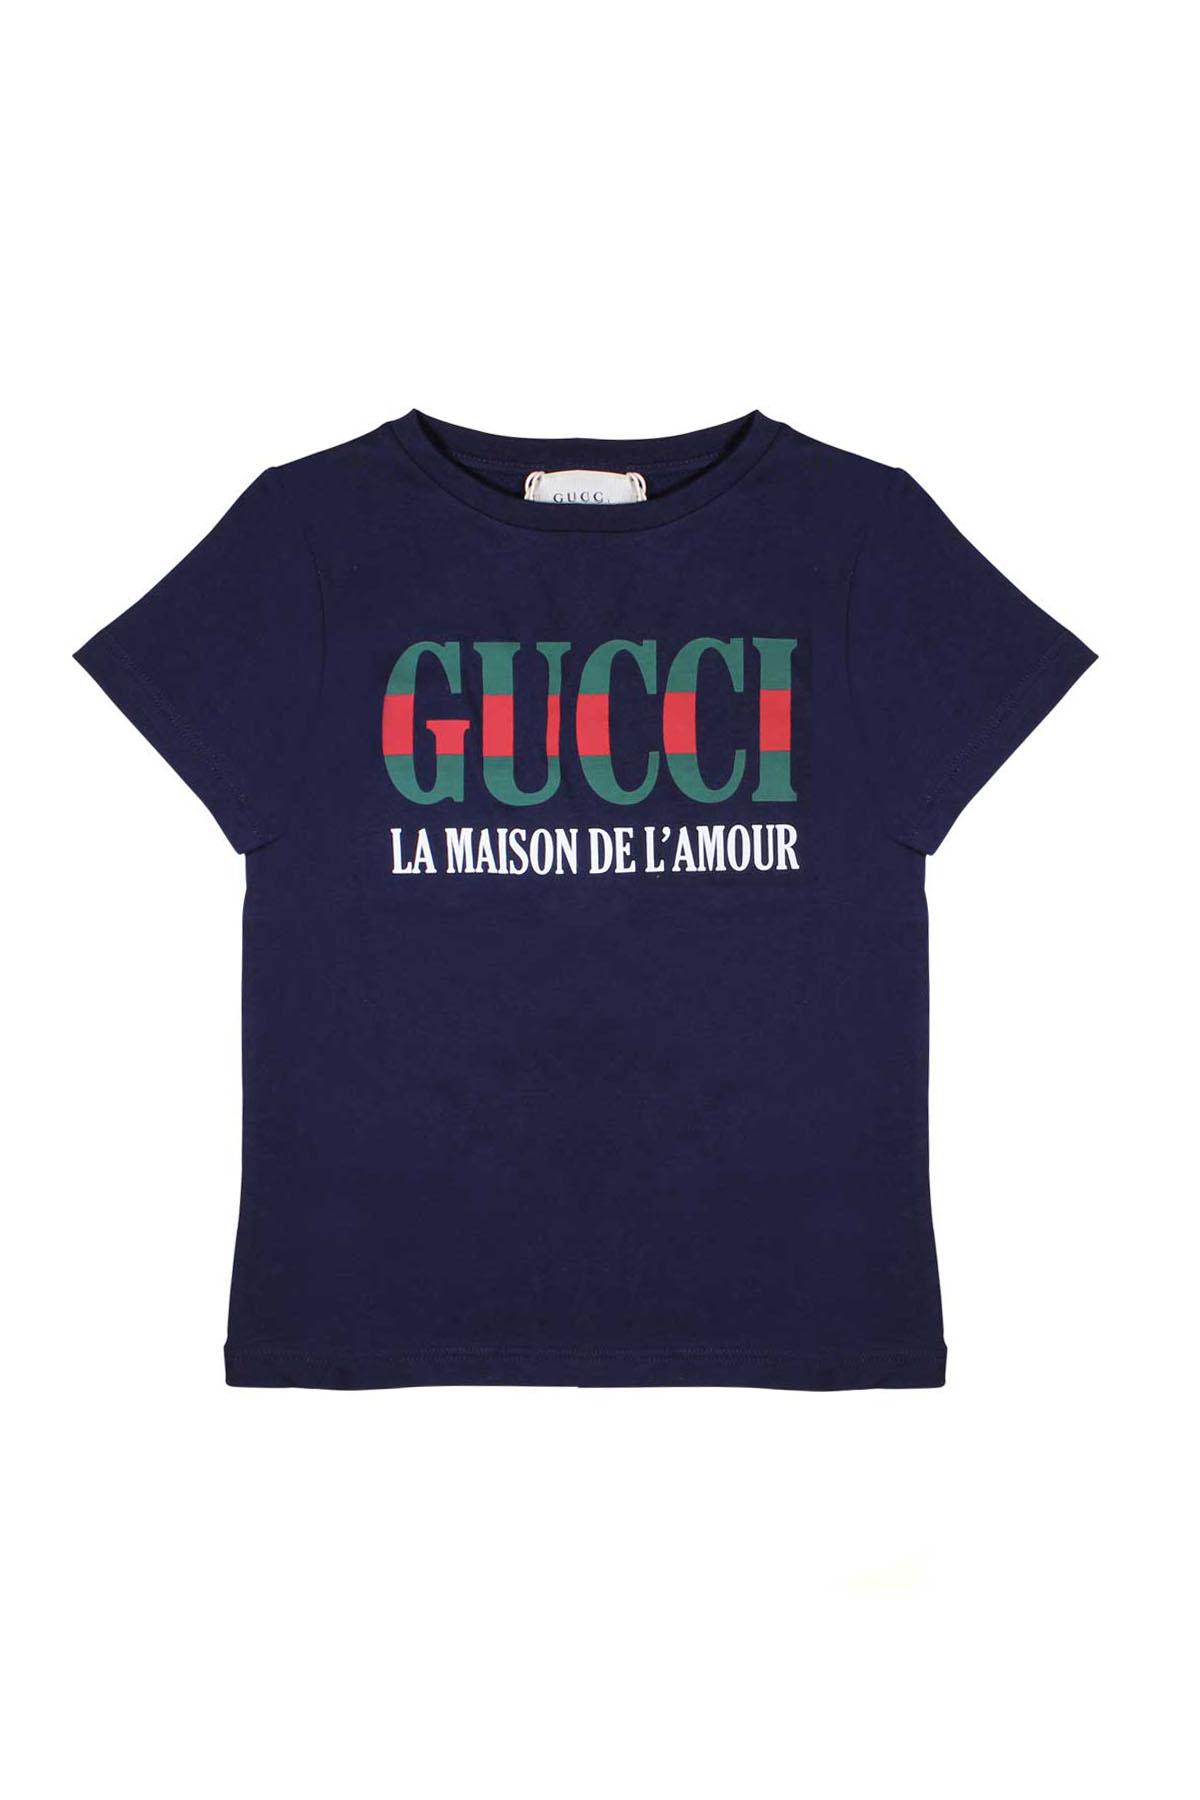 041664eaecef T-SHIRT BLUE FOR BOY GUCCI KIDS - GUCCI KIDS - Mancini Junior